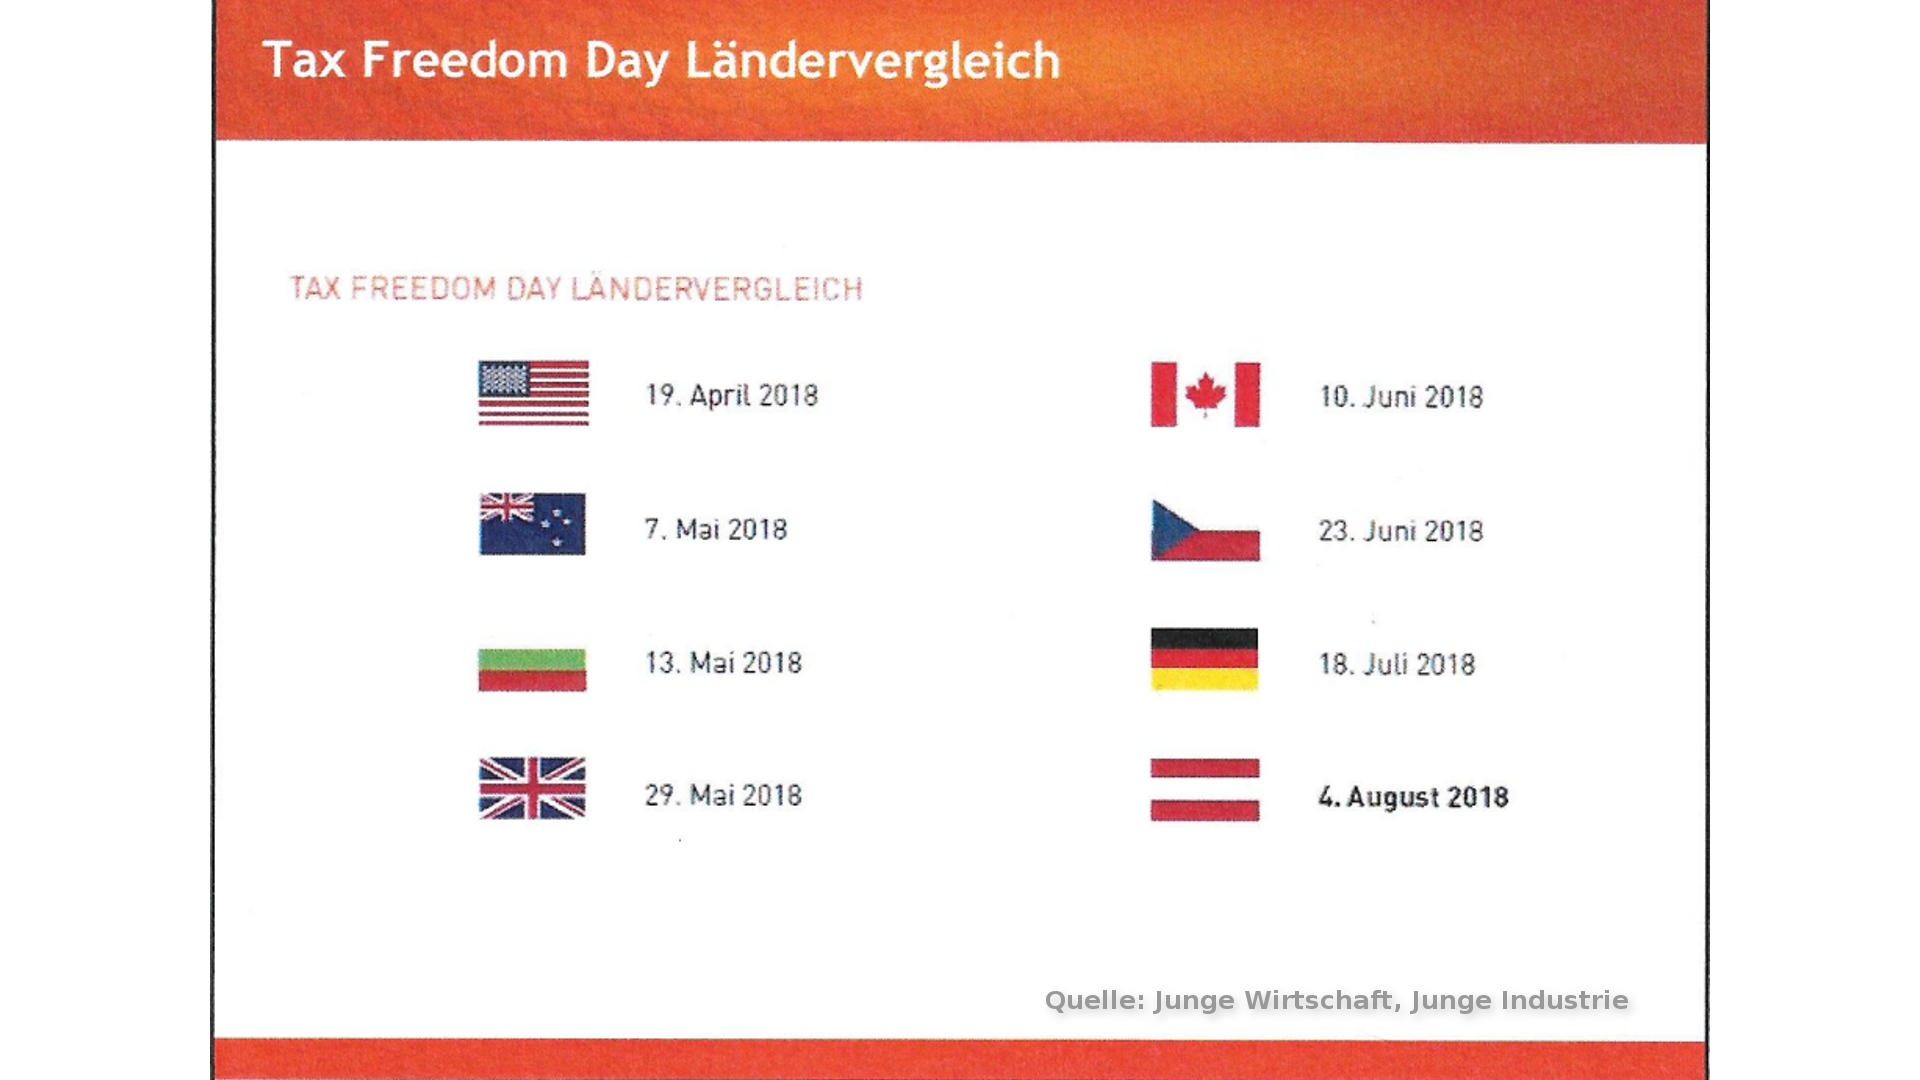 Tax Freedom Day-Ländervergleich